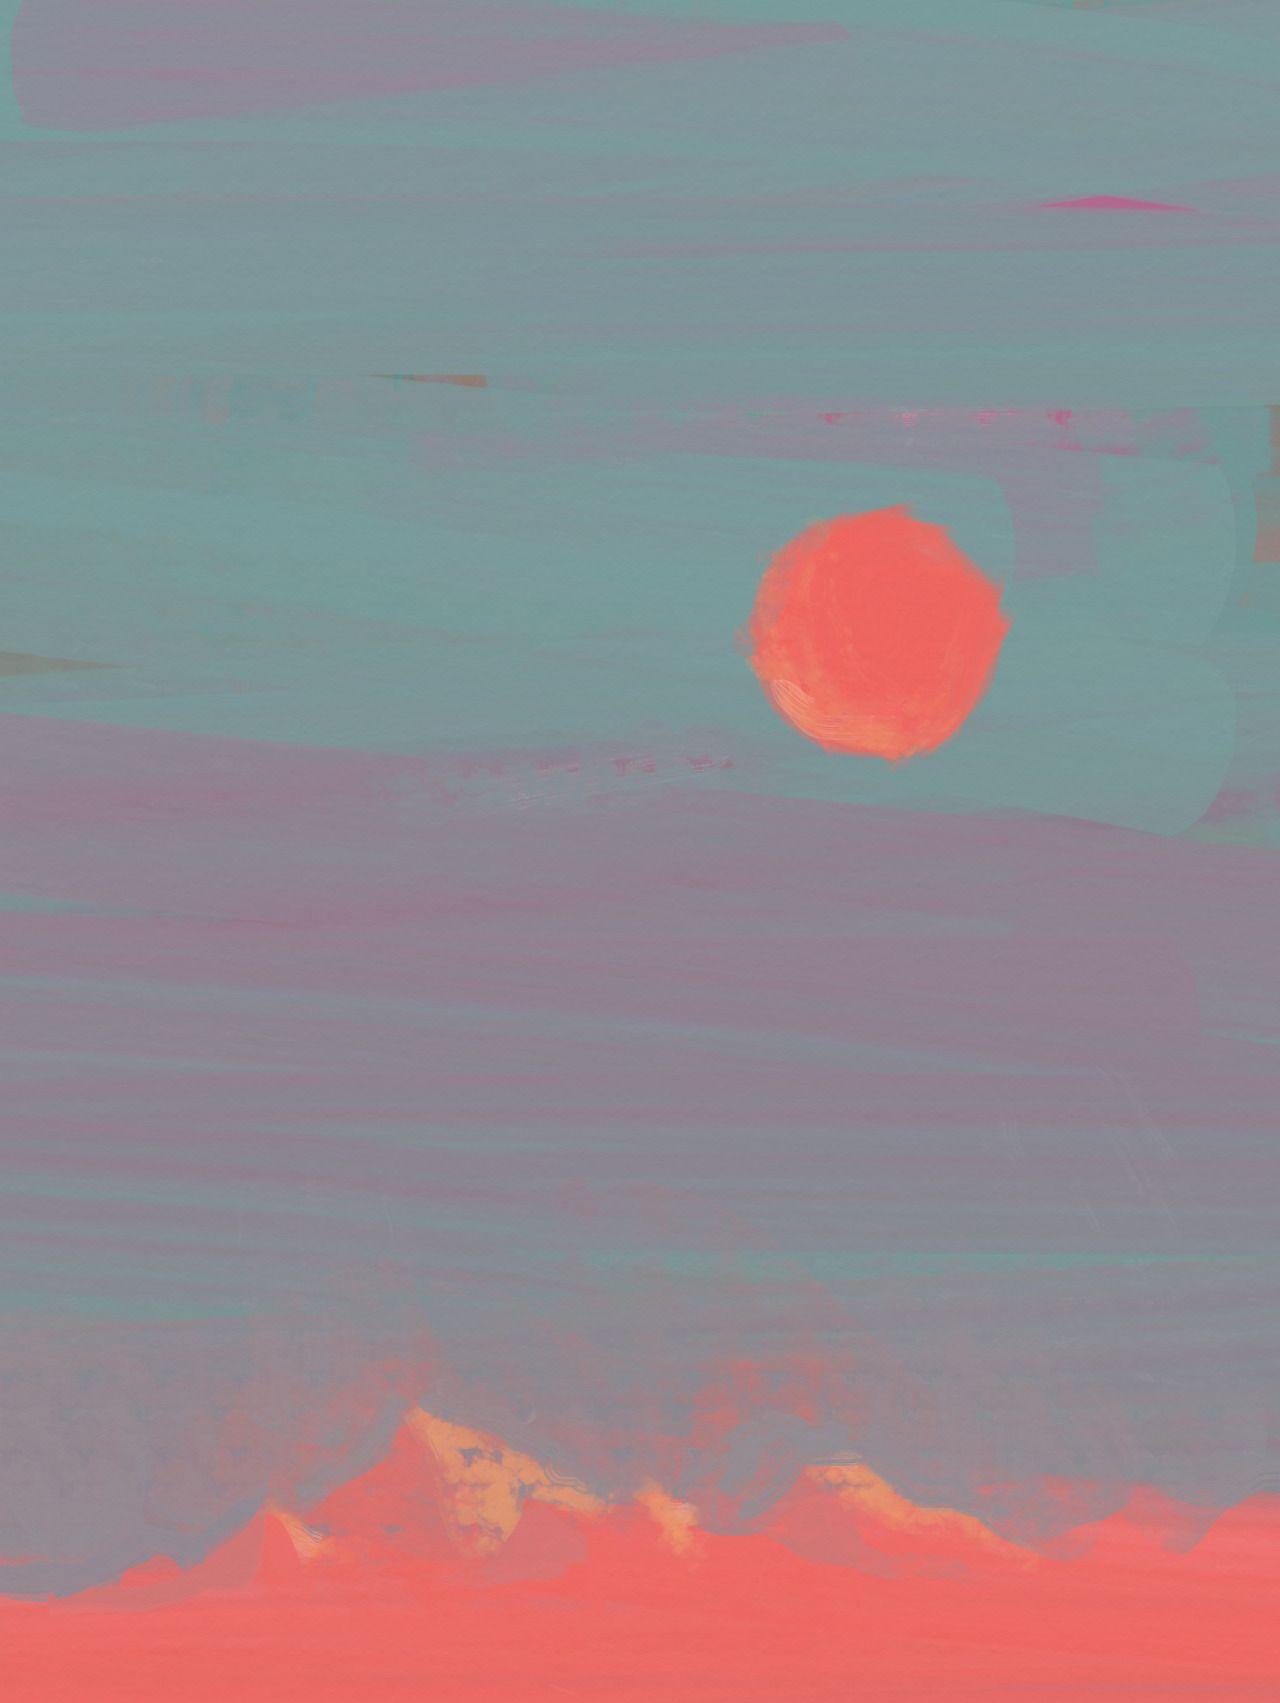 odes-etranges | paint draw make | Pinterest